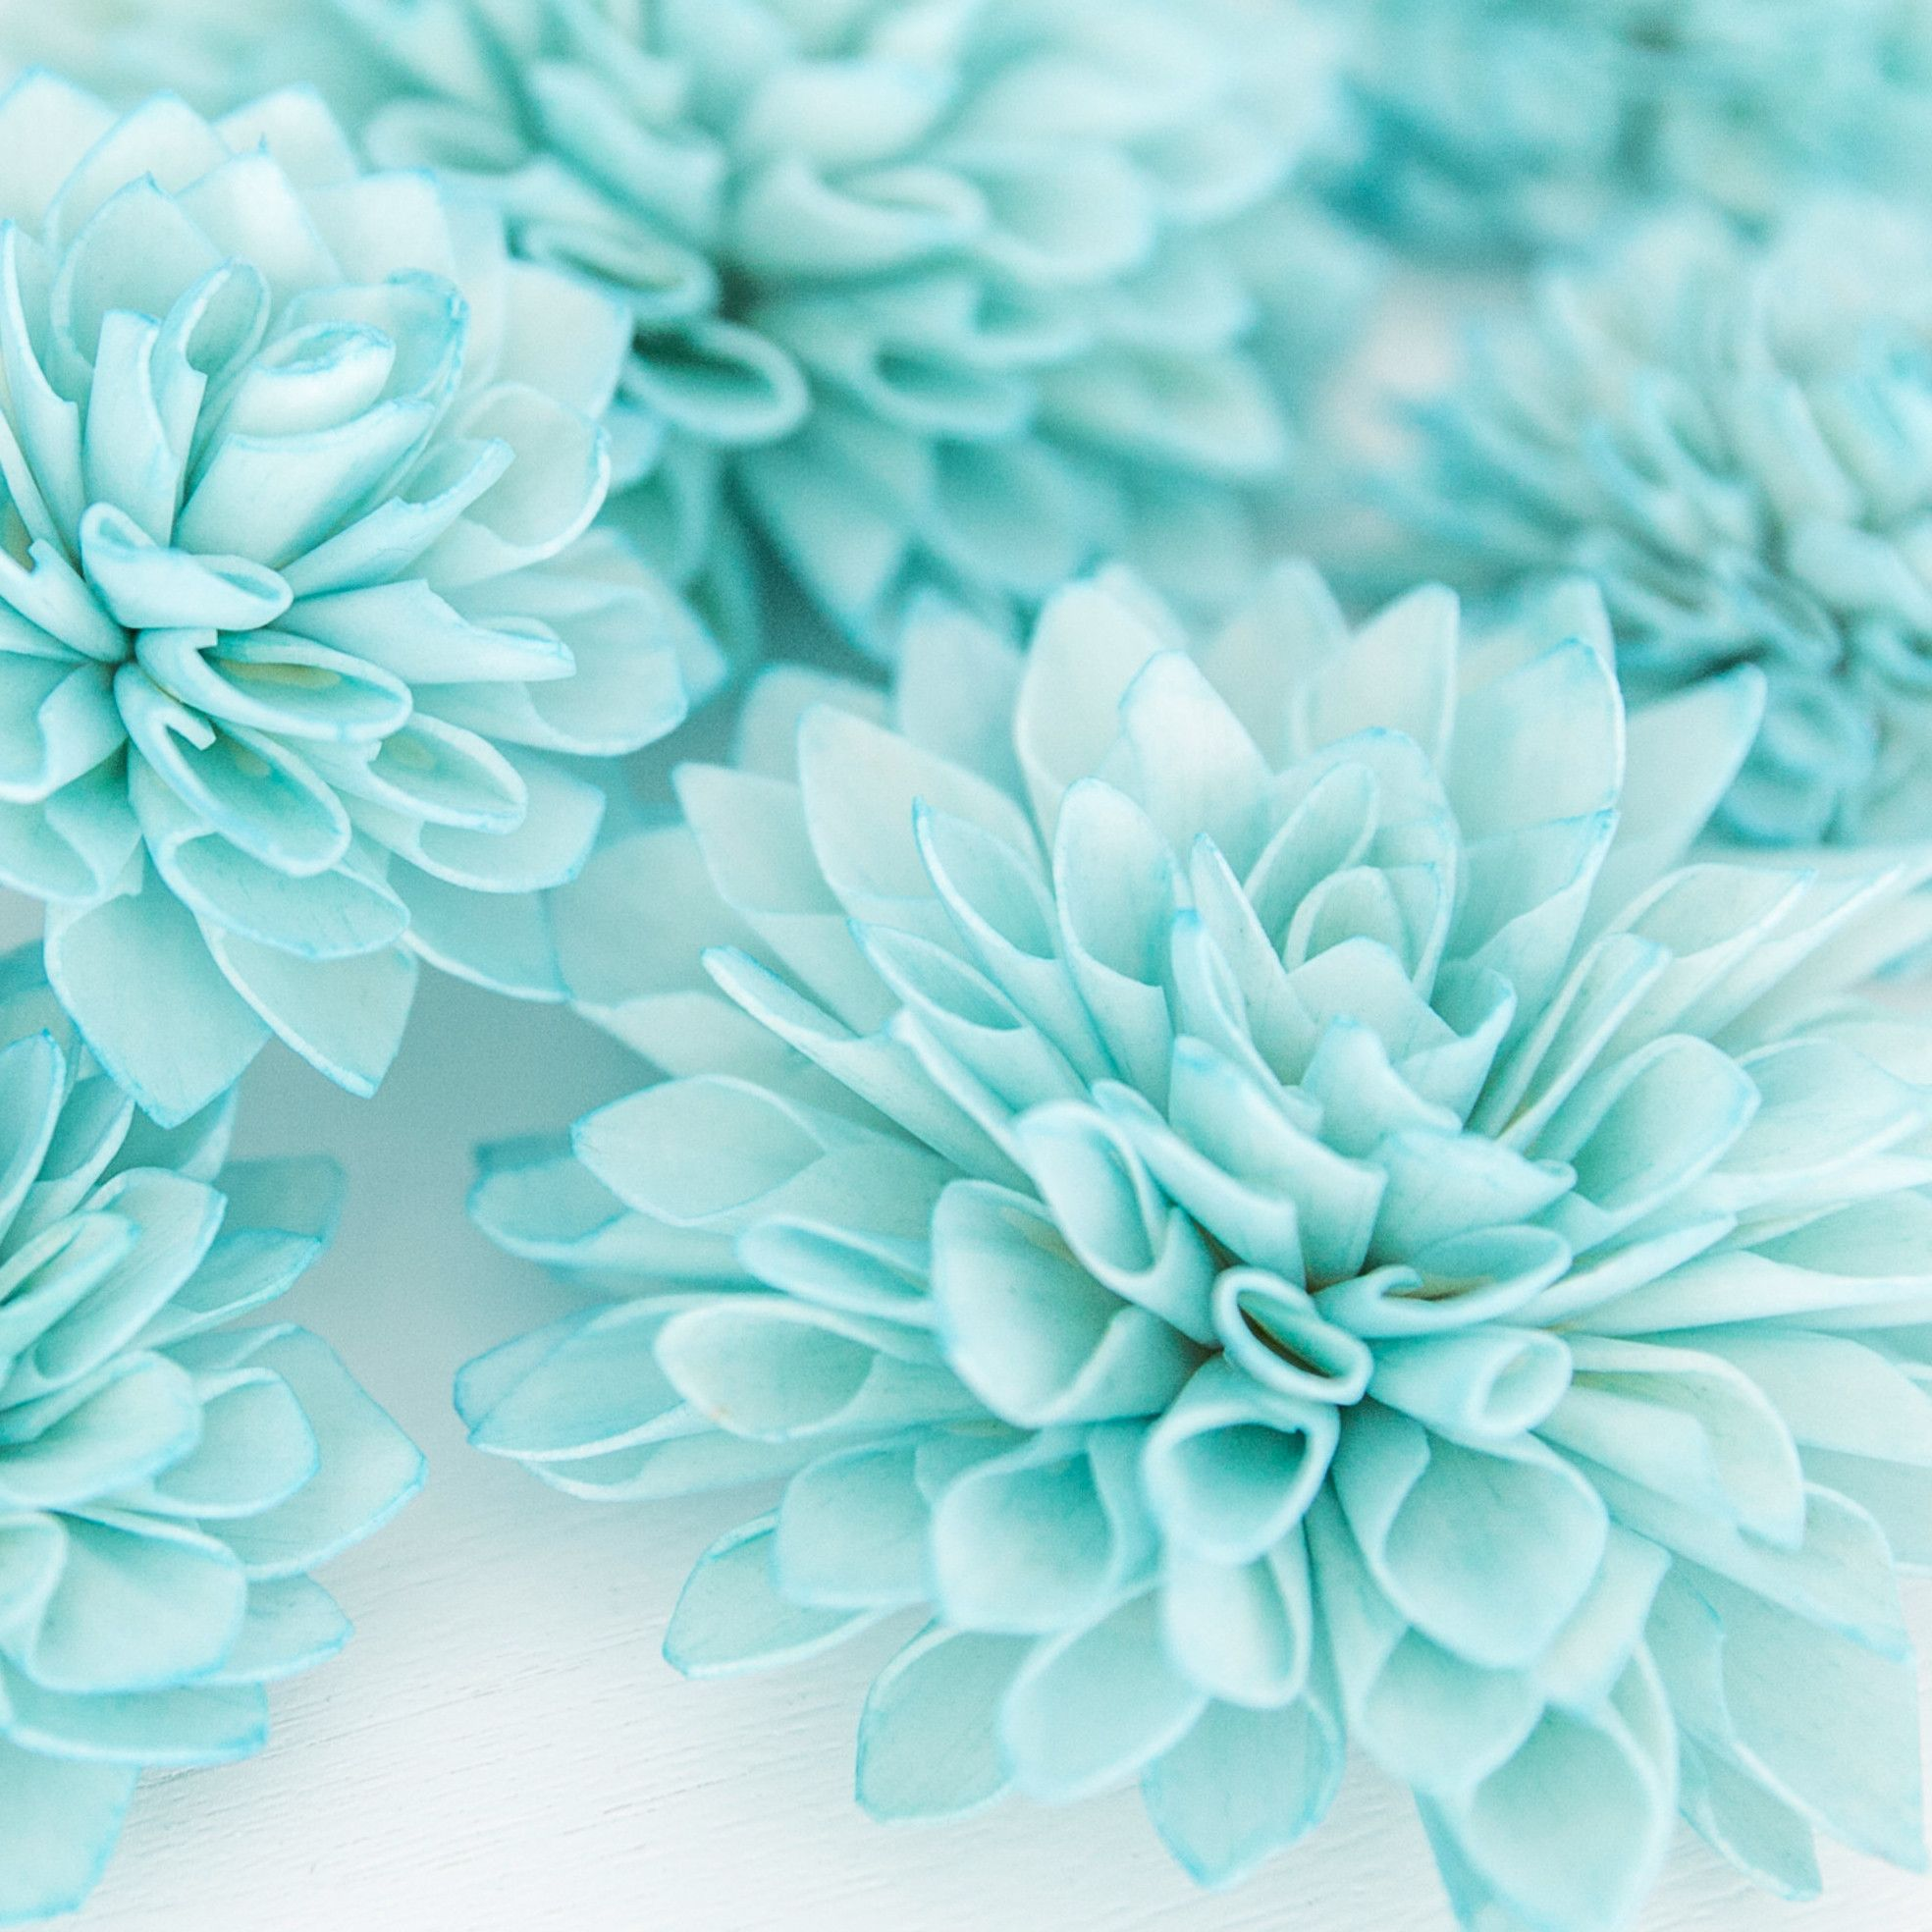 10 Aquamarine Wooden Flowers, Wedding Decorations, Wedding Flowers ...